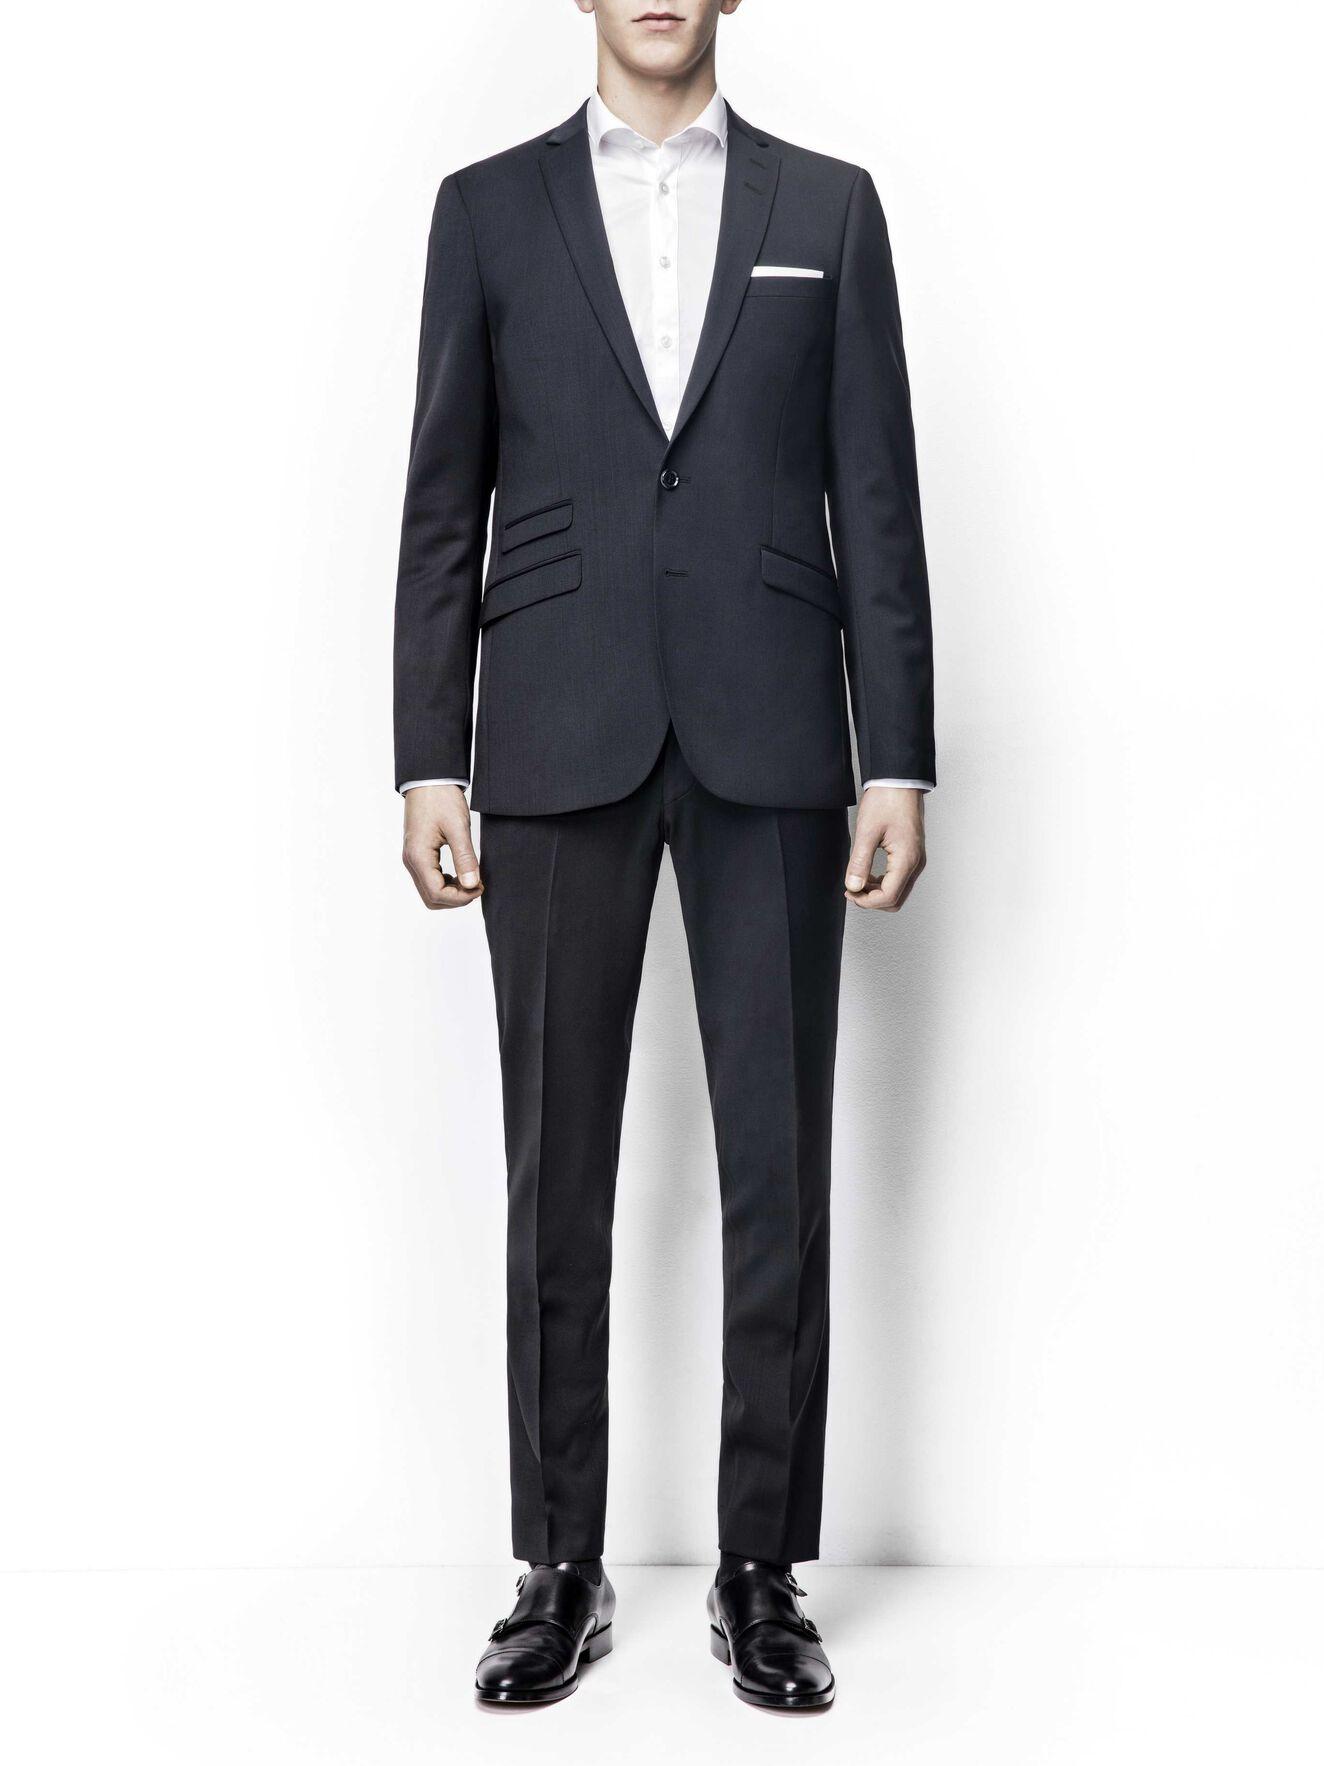 Nedvin suit (Short size) in Black from Tiger of Sweden